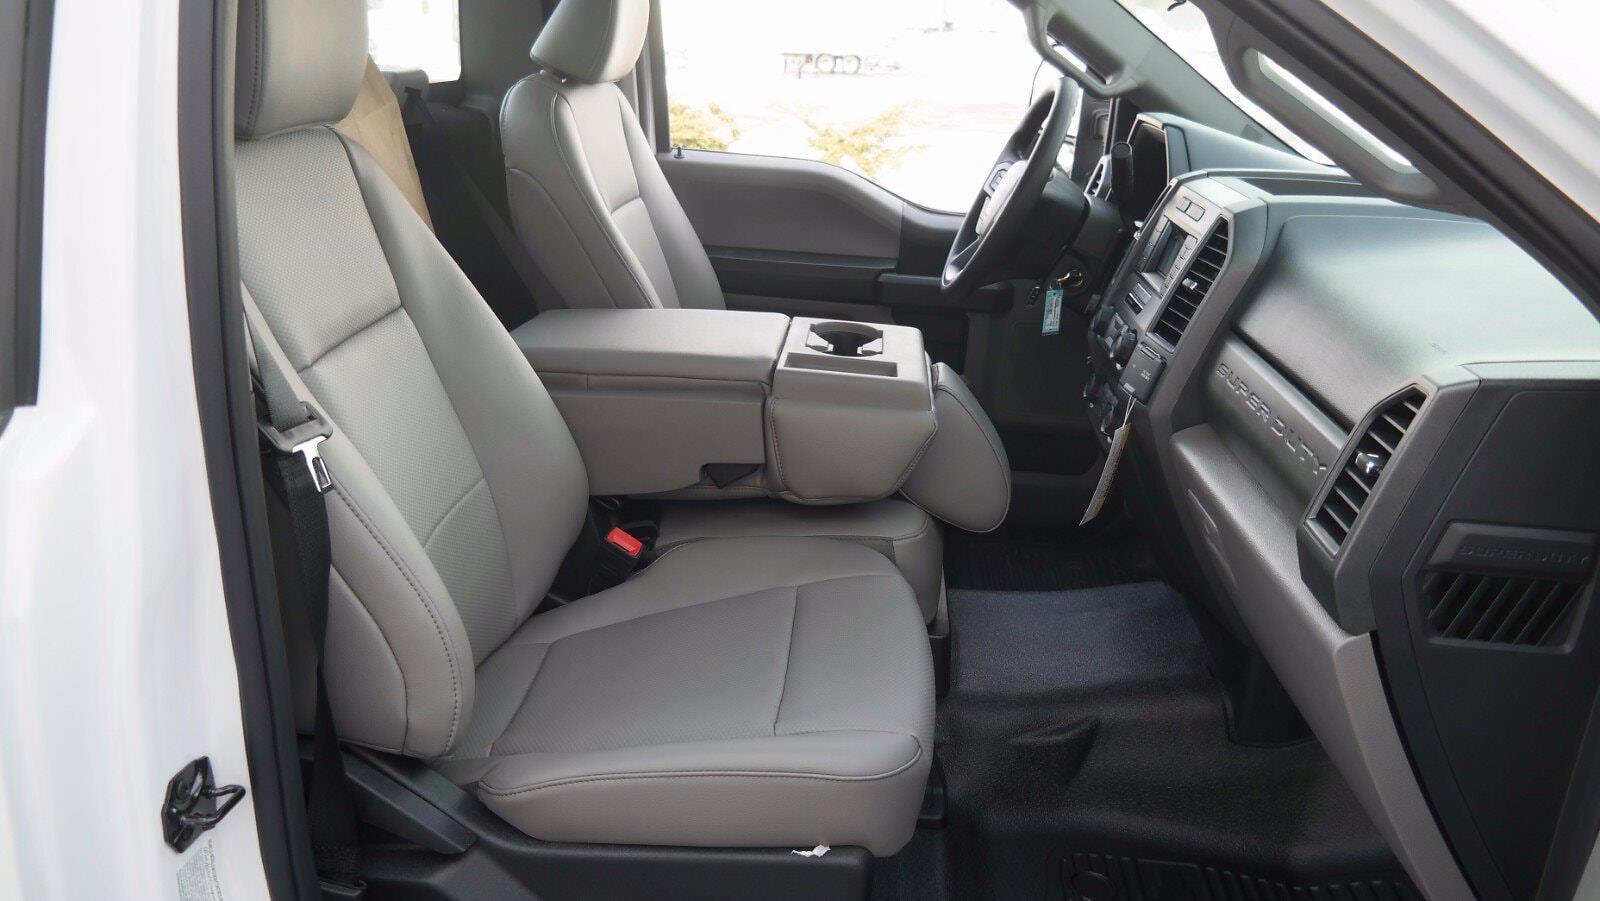 2021 Ford F-600 Regular Cab DRW 4x4, Cab Chassis #FLU10124 - photo 5